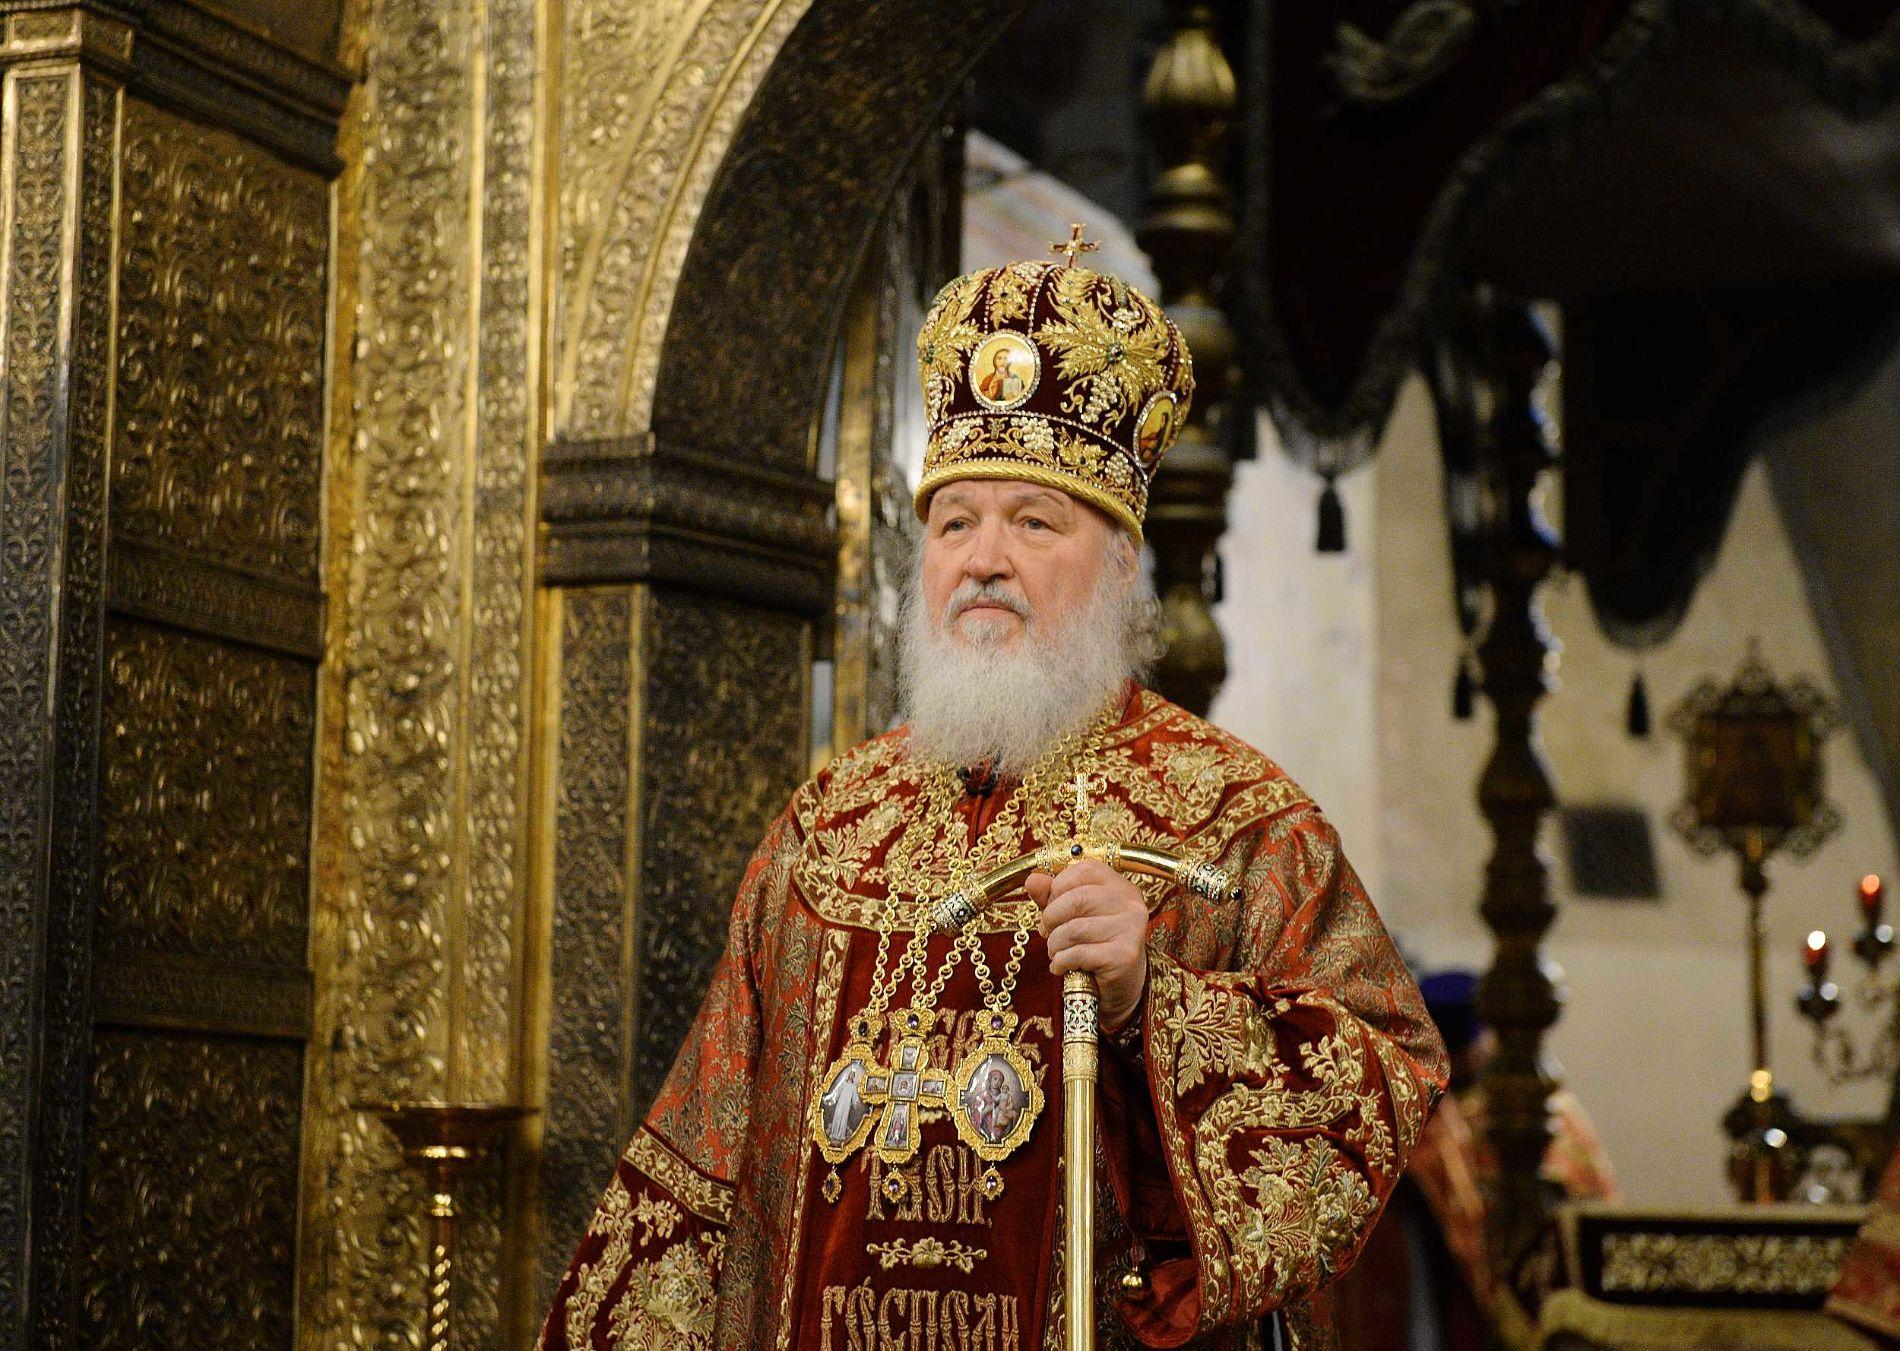 The Bell: Патриарх Кирилл летал на частном самолете за 43 млн долларов